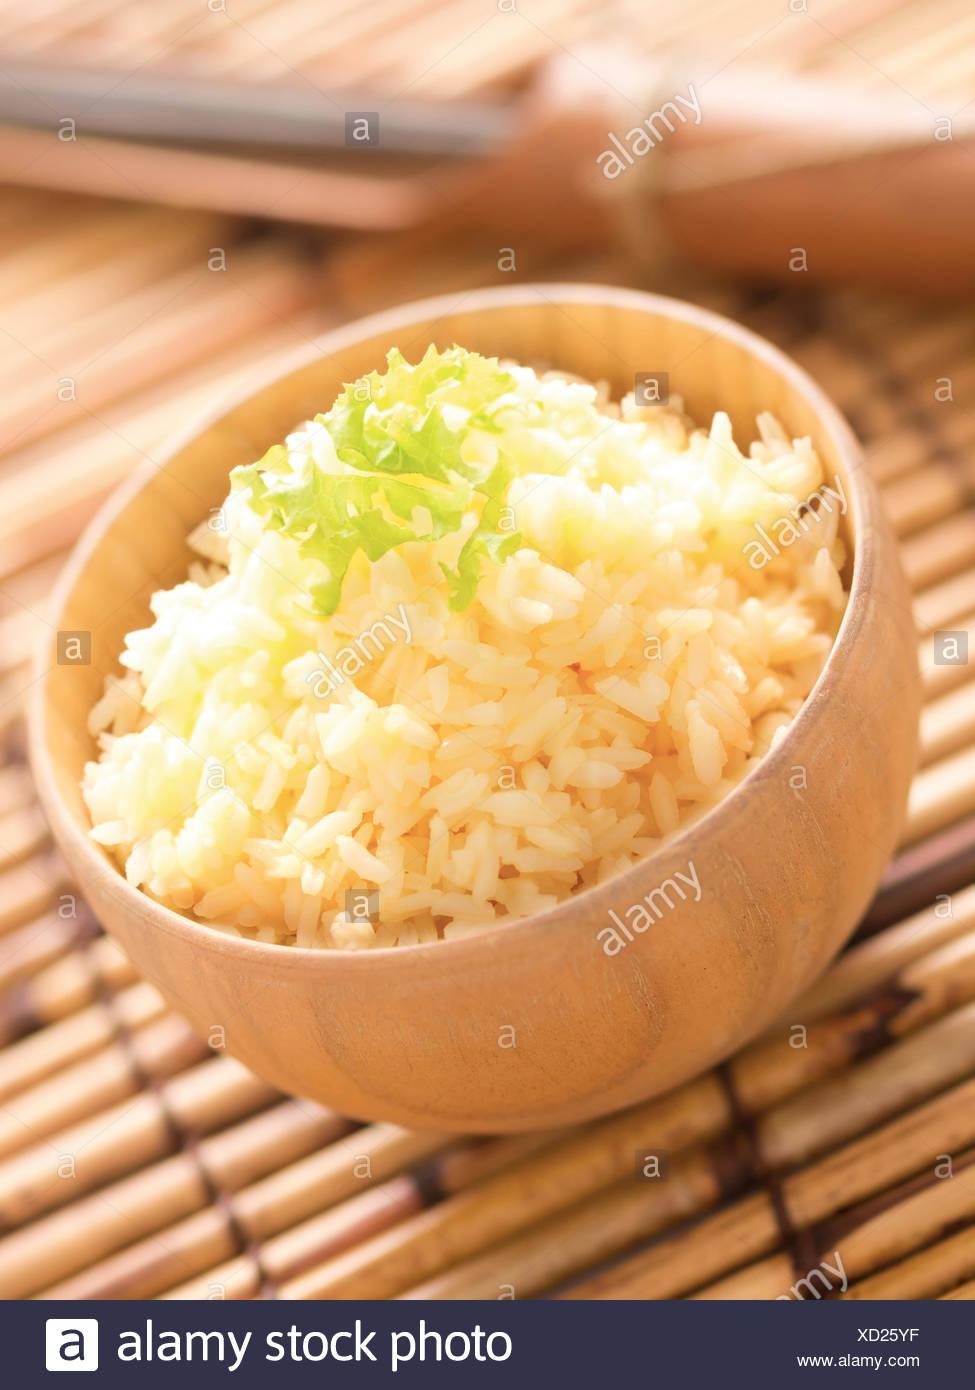 raw, egg, japanese, rice, food, breakfeast, breakfast, food, aliment, colour, - Stock Image